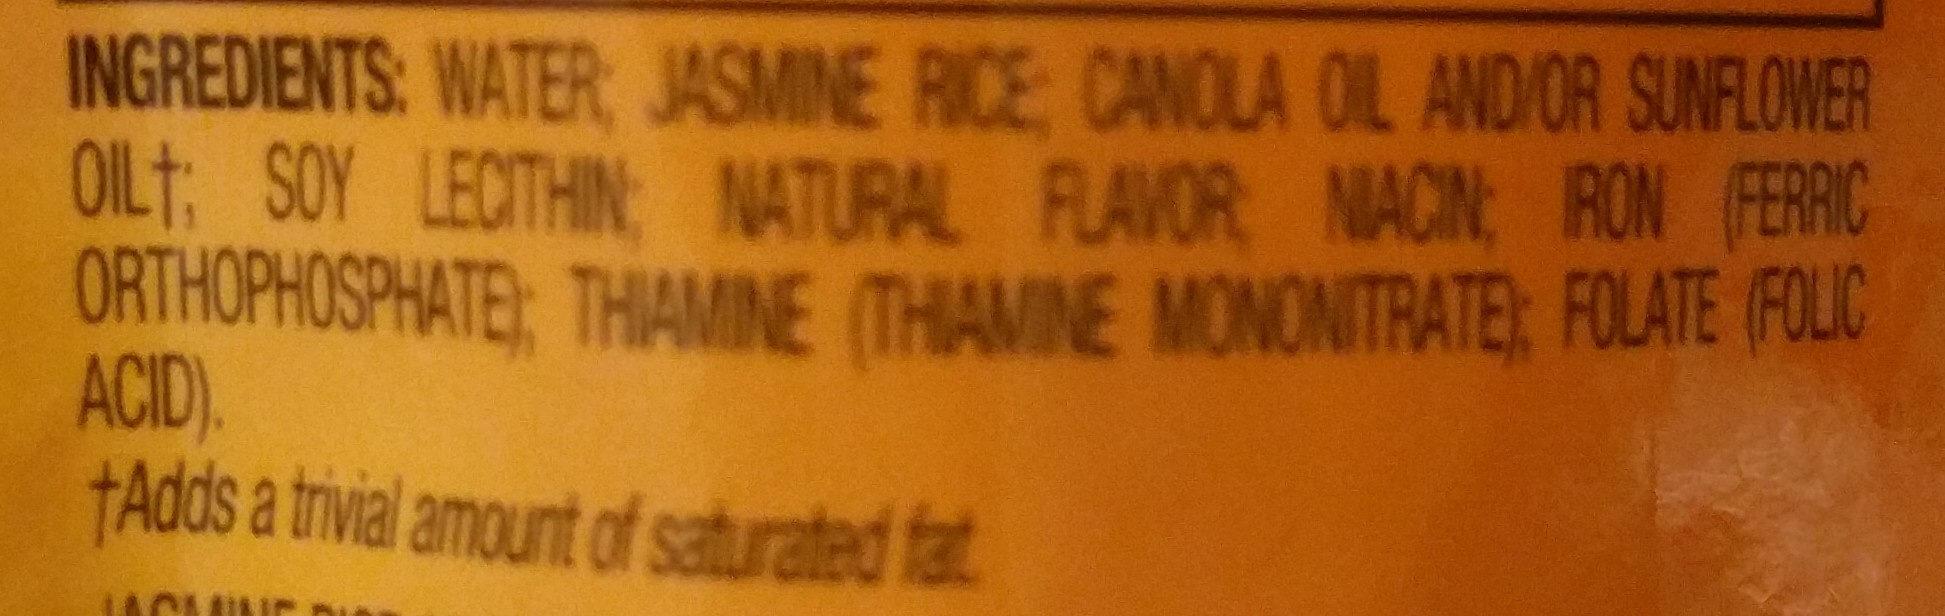 Jasmine rice - Ingredients - en